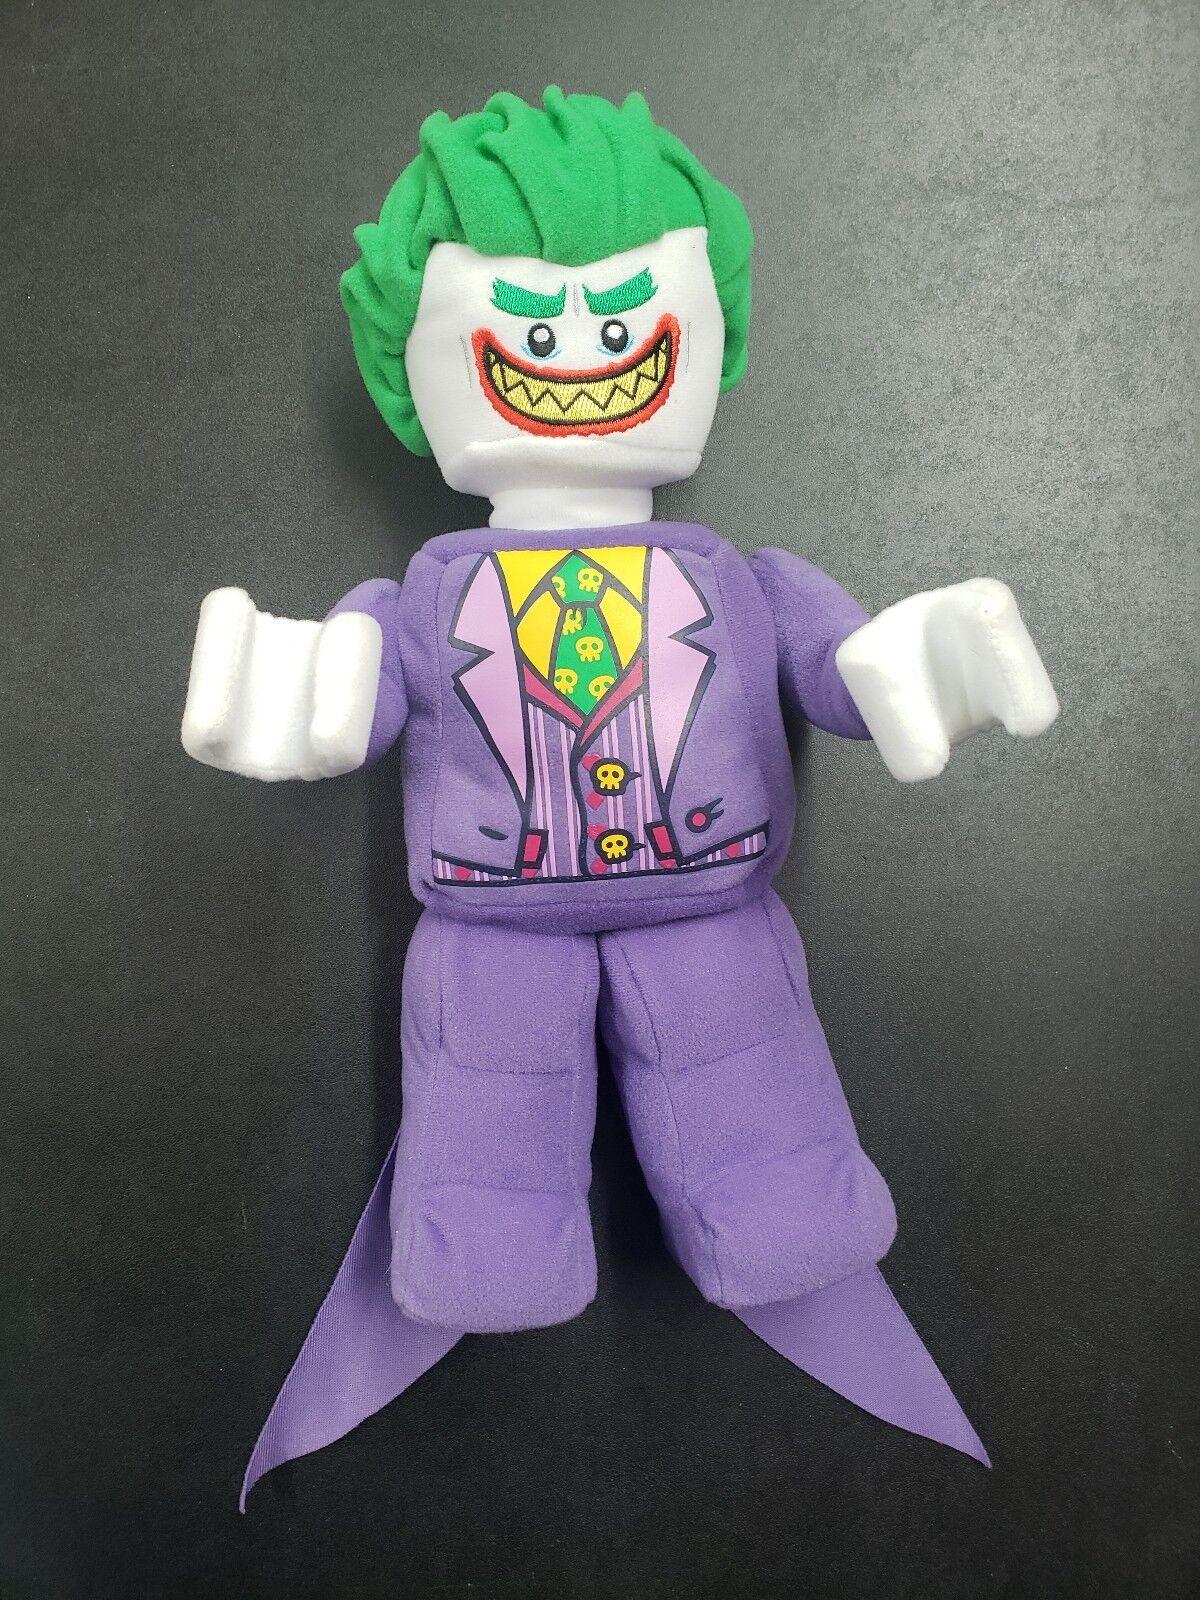 THE LEGO BATMAN MOVIE The Joker Minifigure Plush 853660 - Super Rare